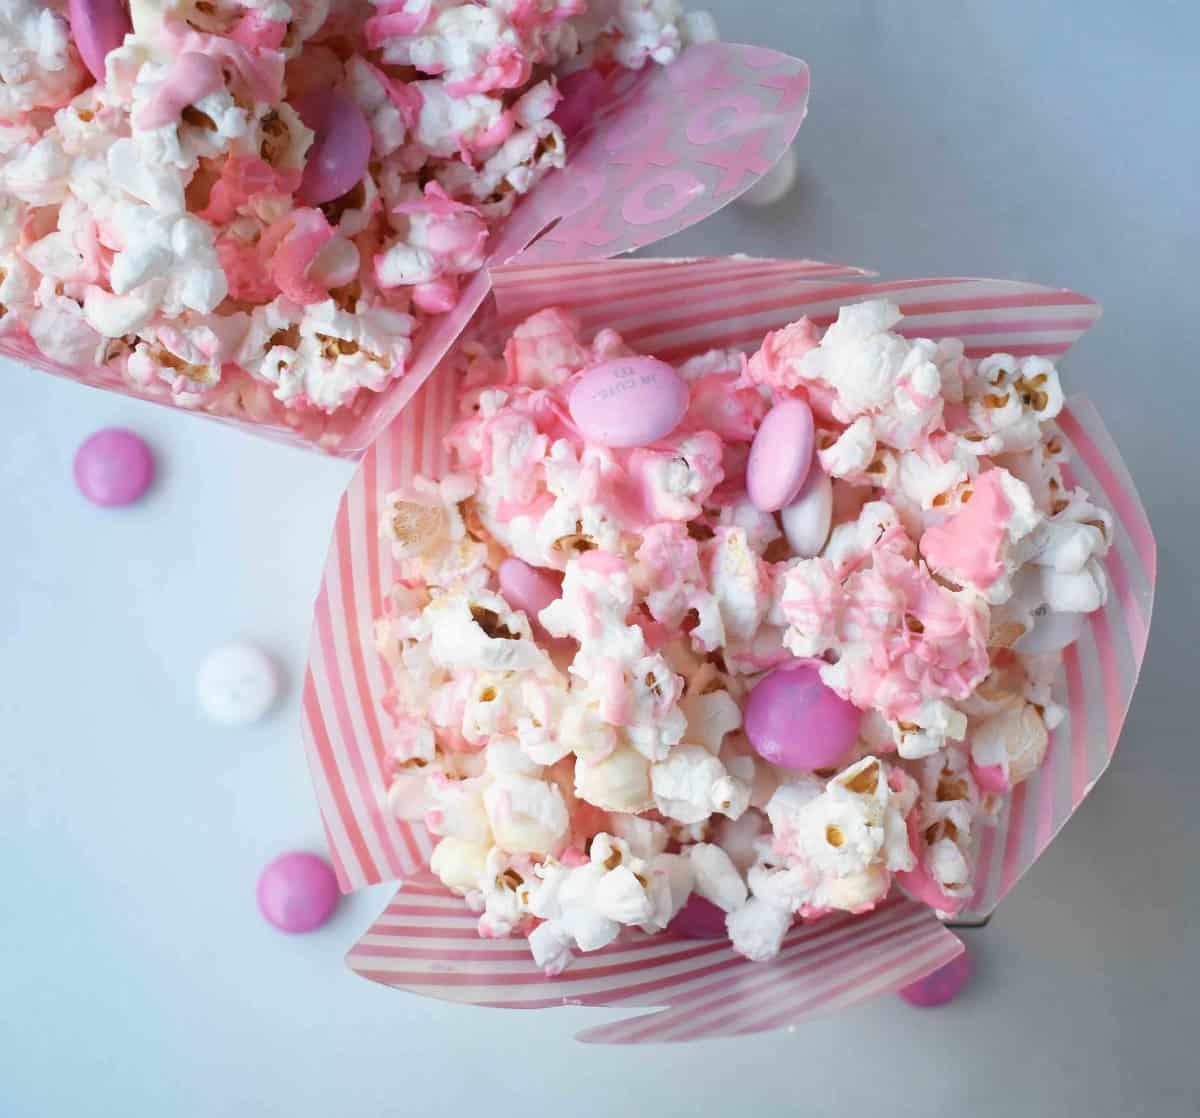 Homemade Valentine's Day White Chocolate and M & M Popcorn. www.modernhoney.com